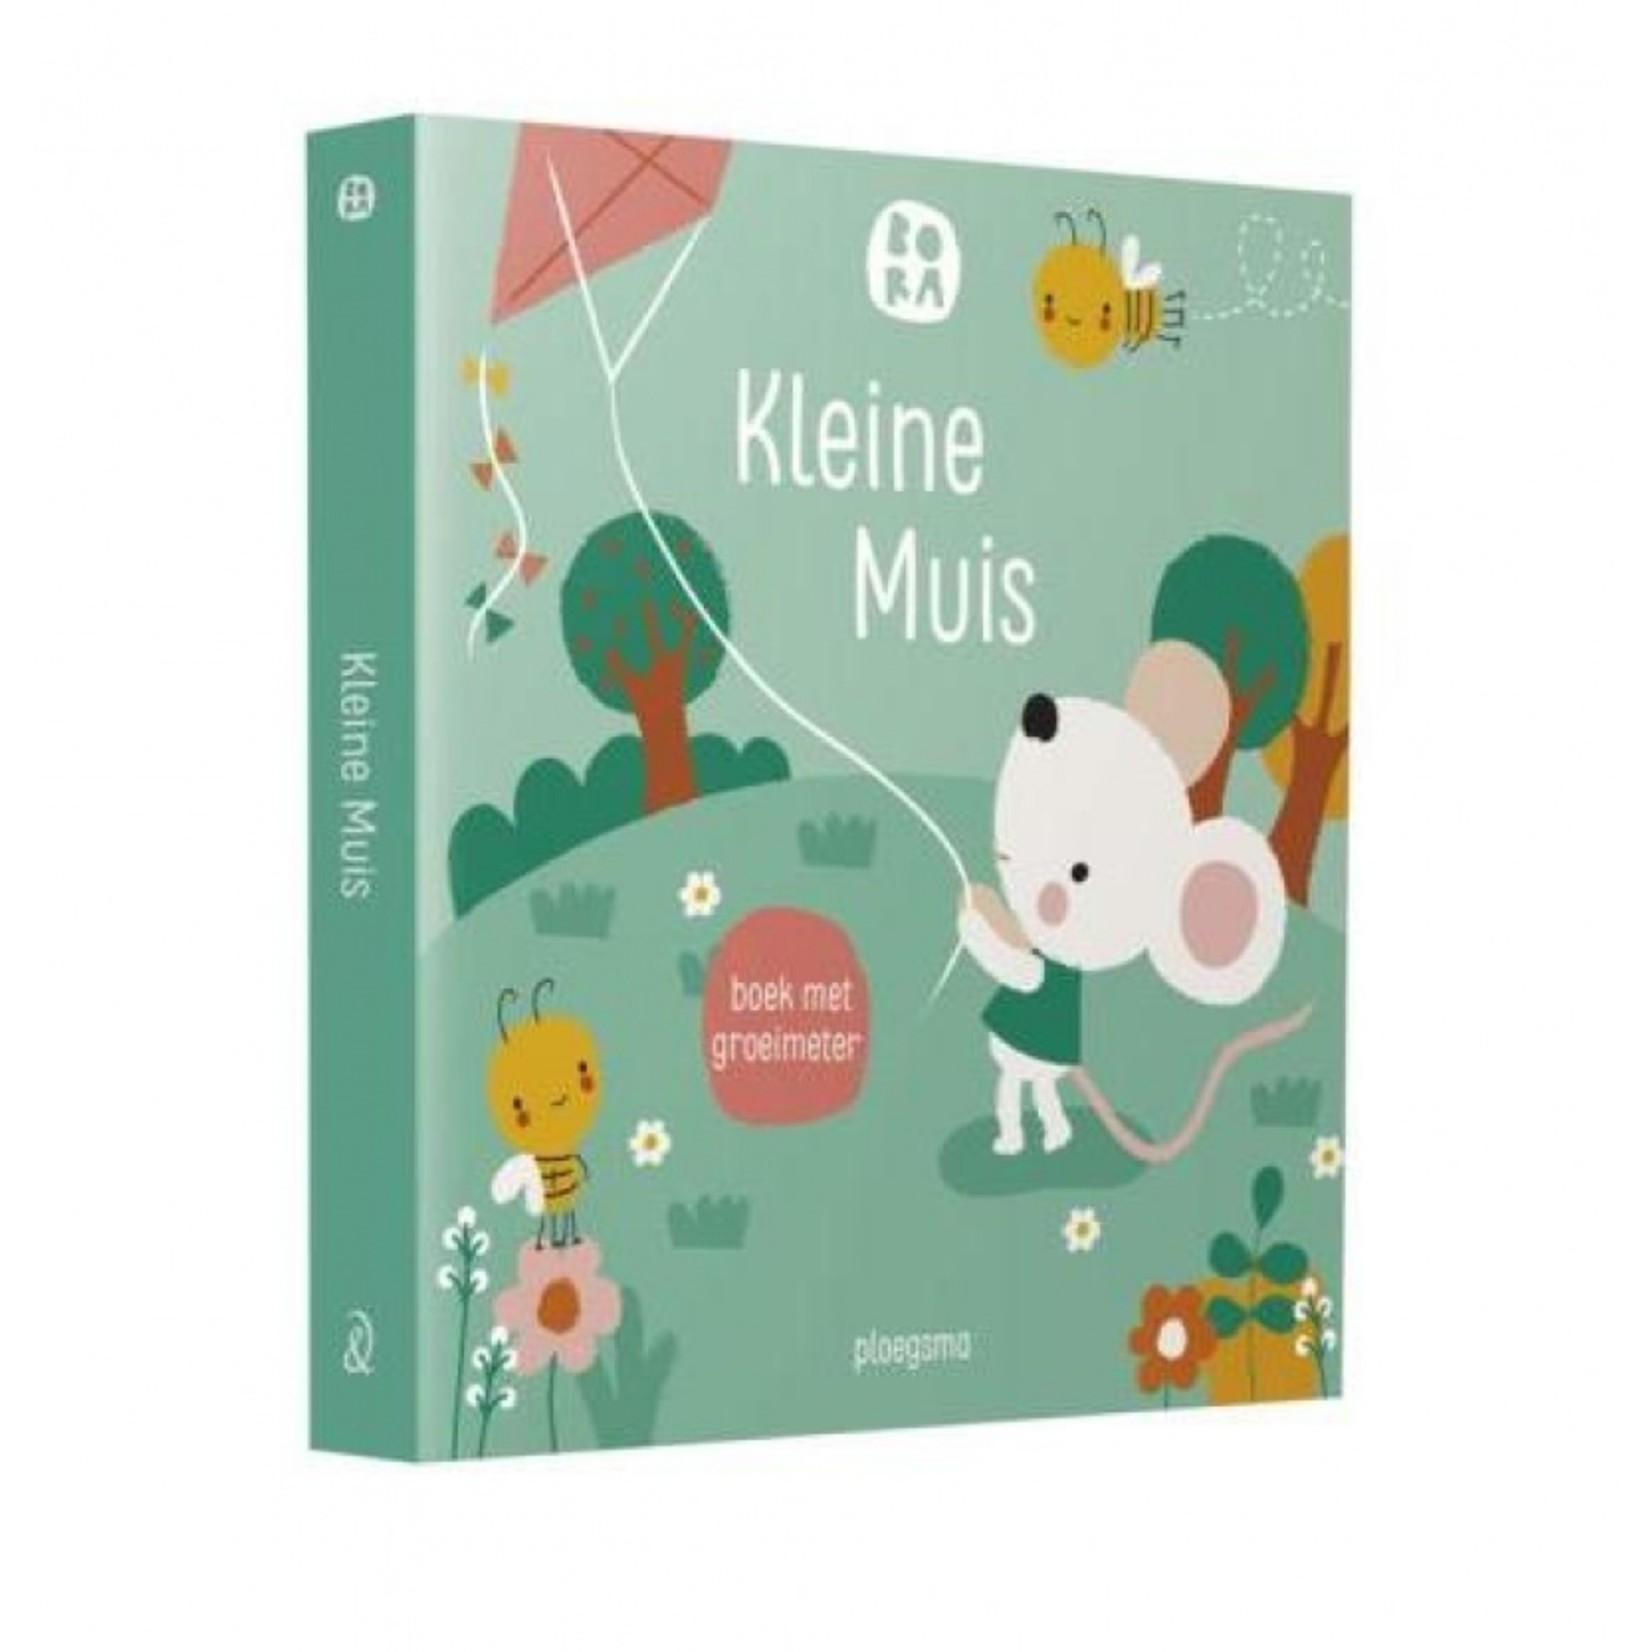 Kartonboekje - Kleine muis